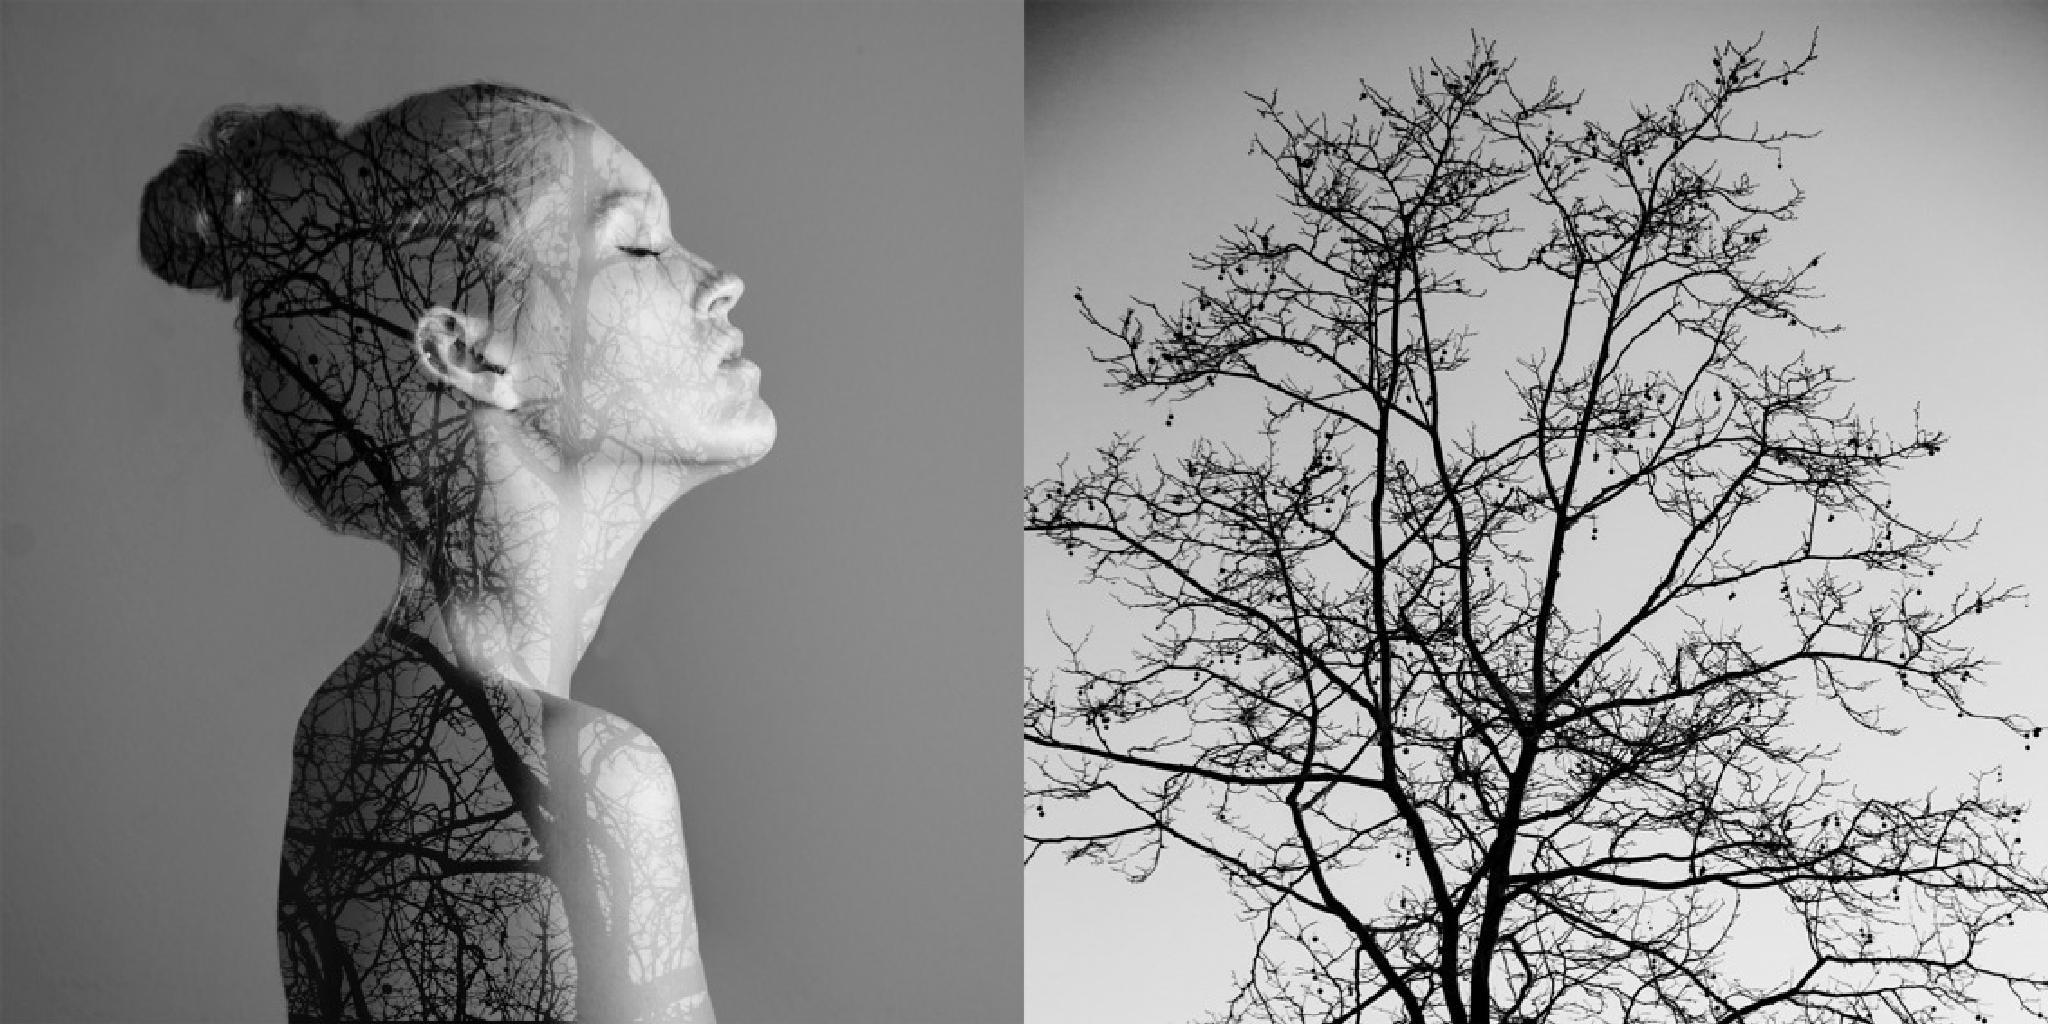 lost in nature by Anne Zwart